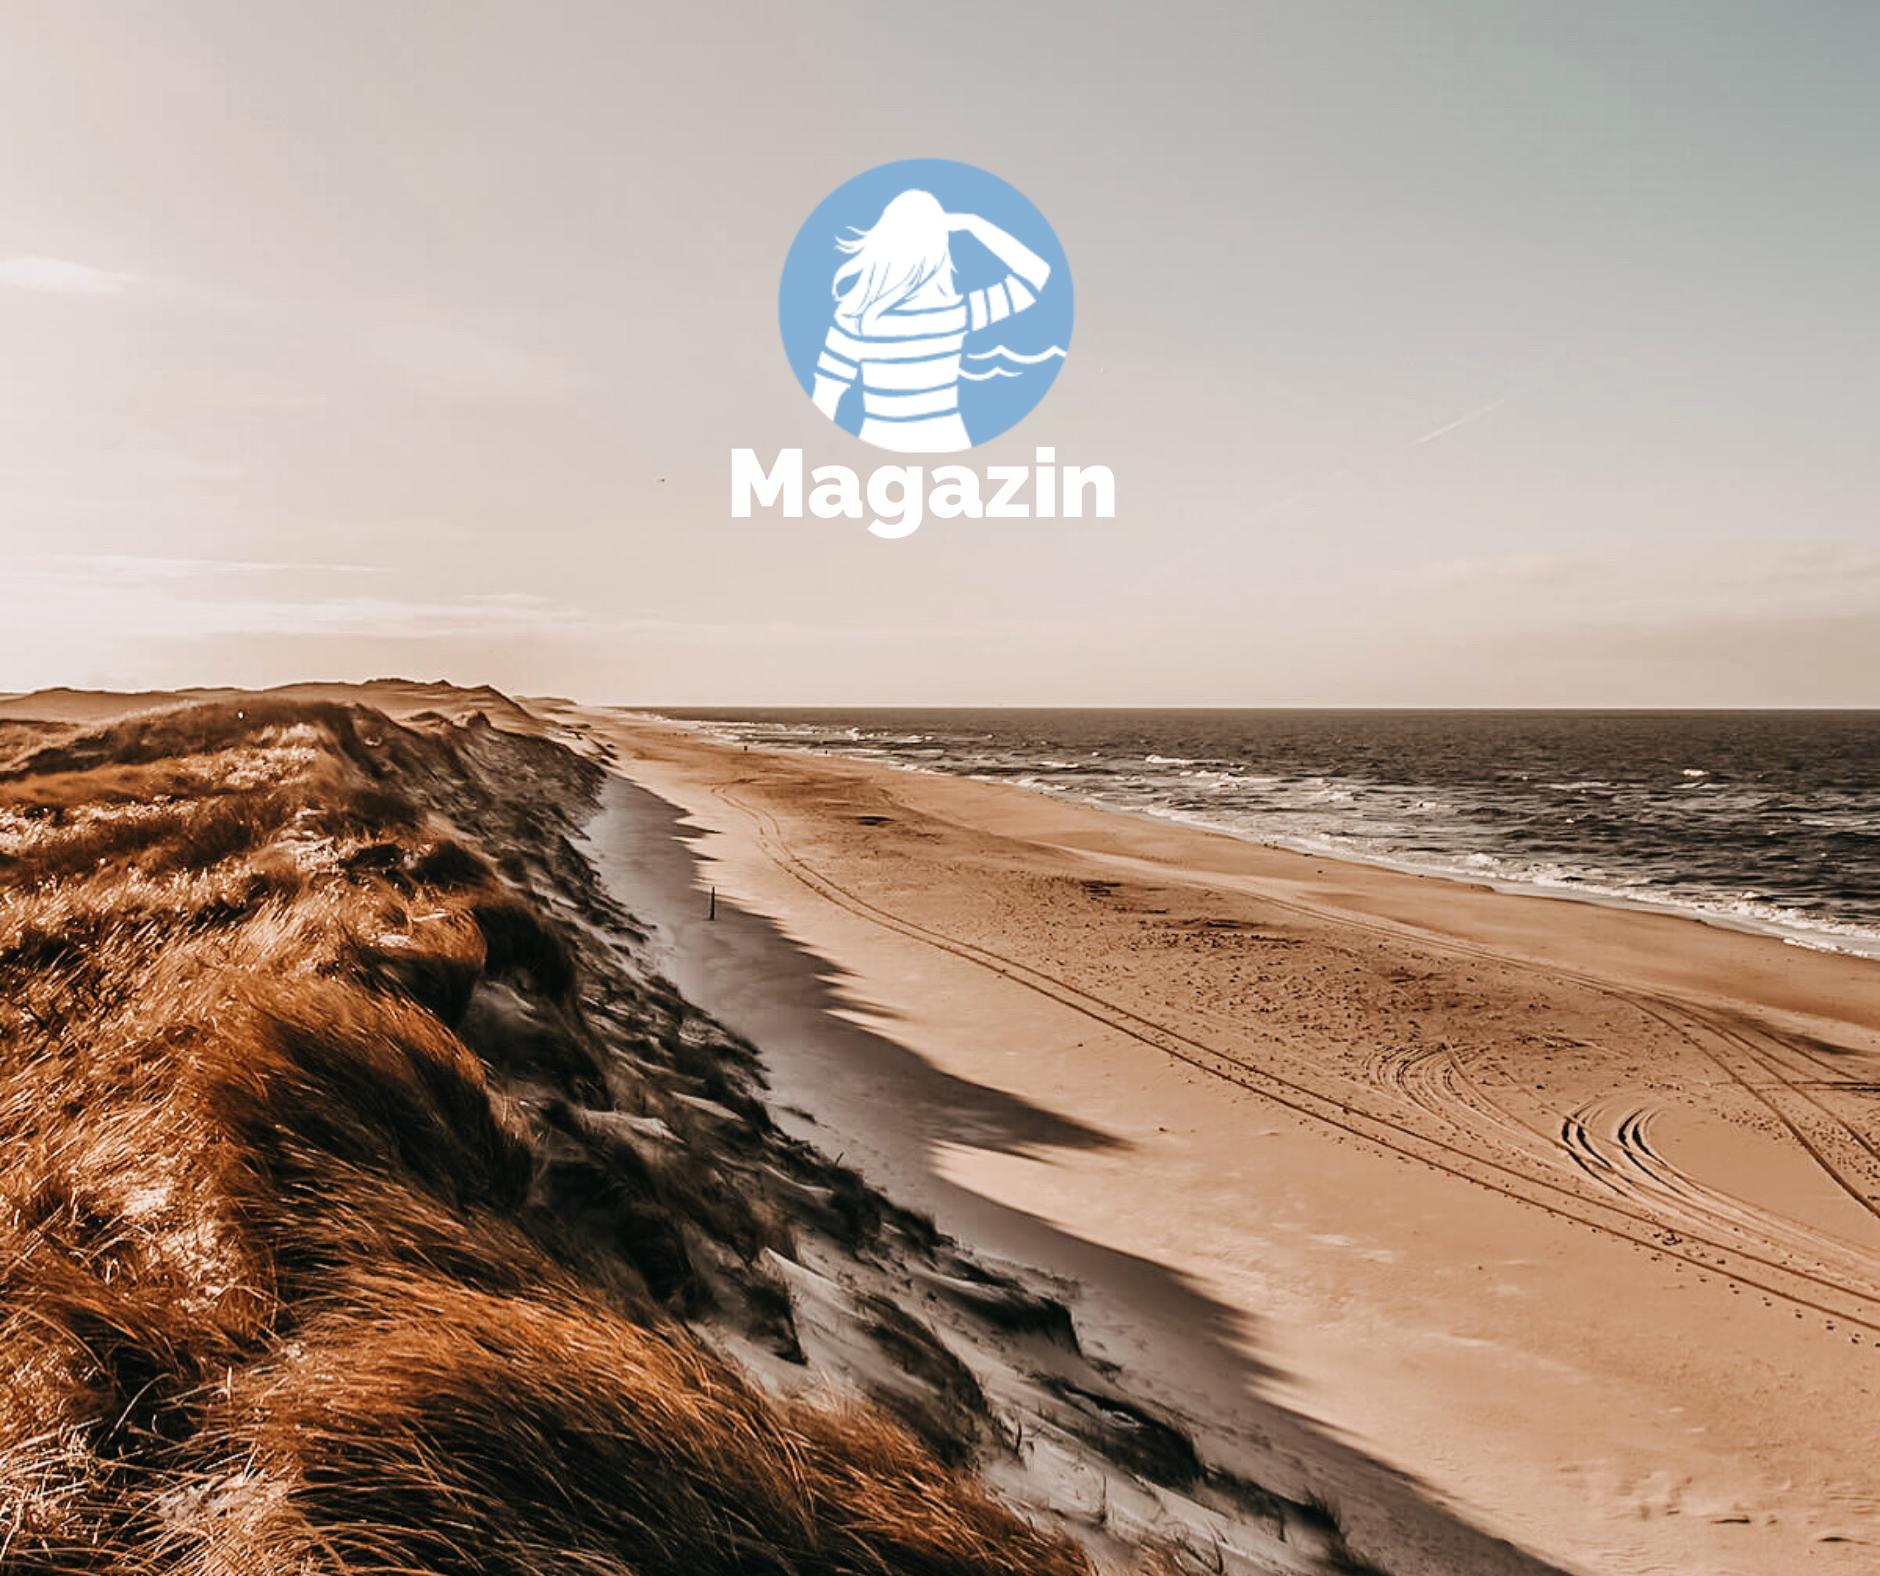 Sylt Fräulein Magazin